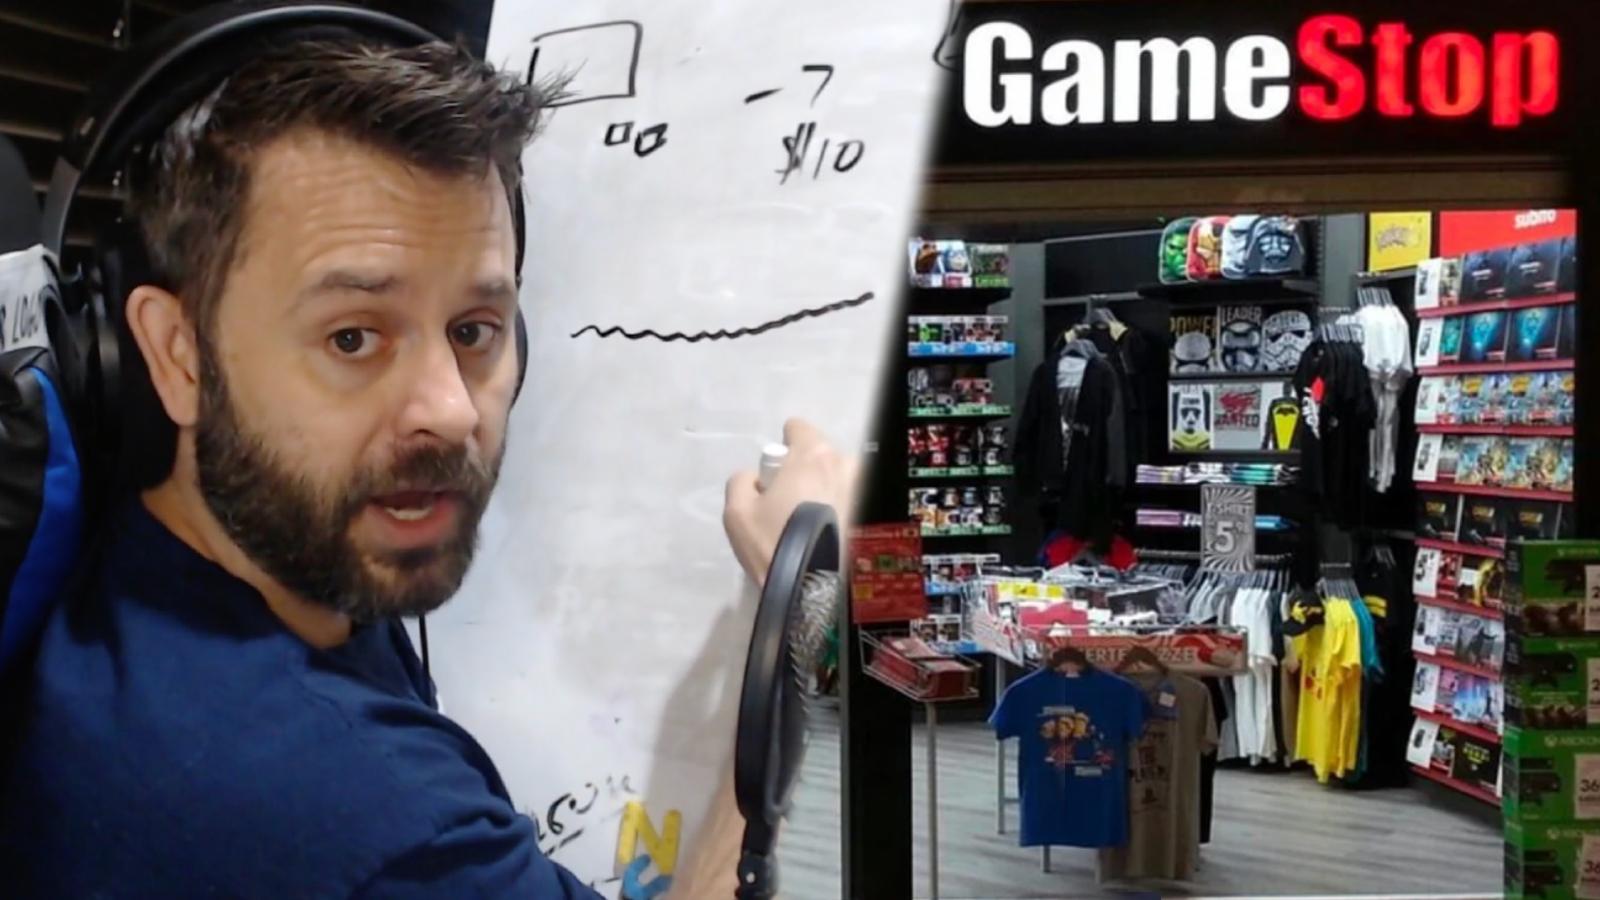 GameStop stock price explained